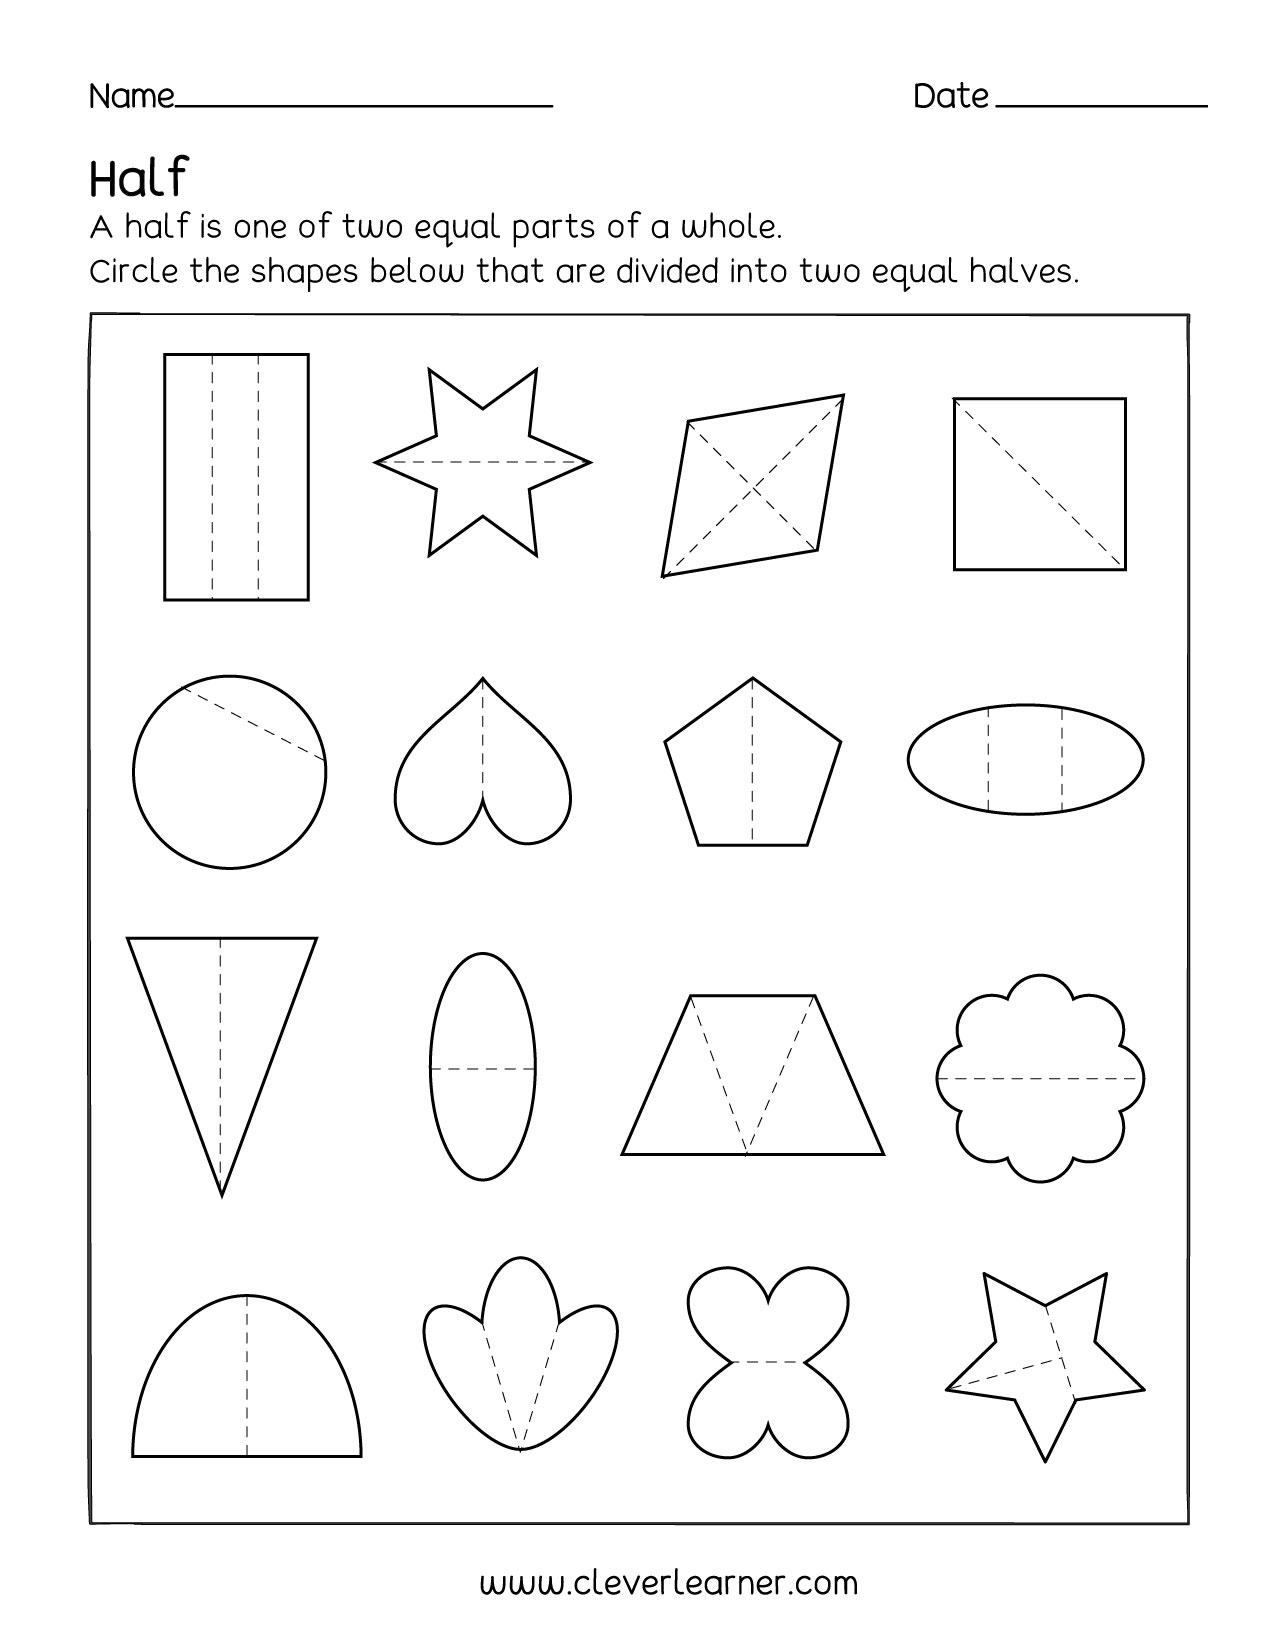 Fun activity on fractions, Half (1/2) worksheets for children